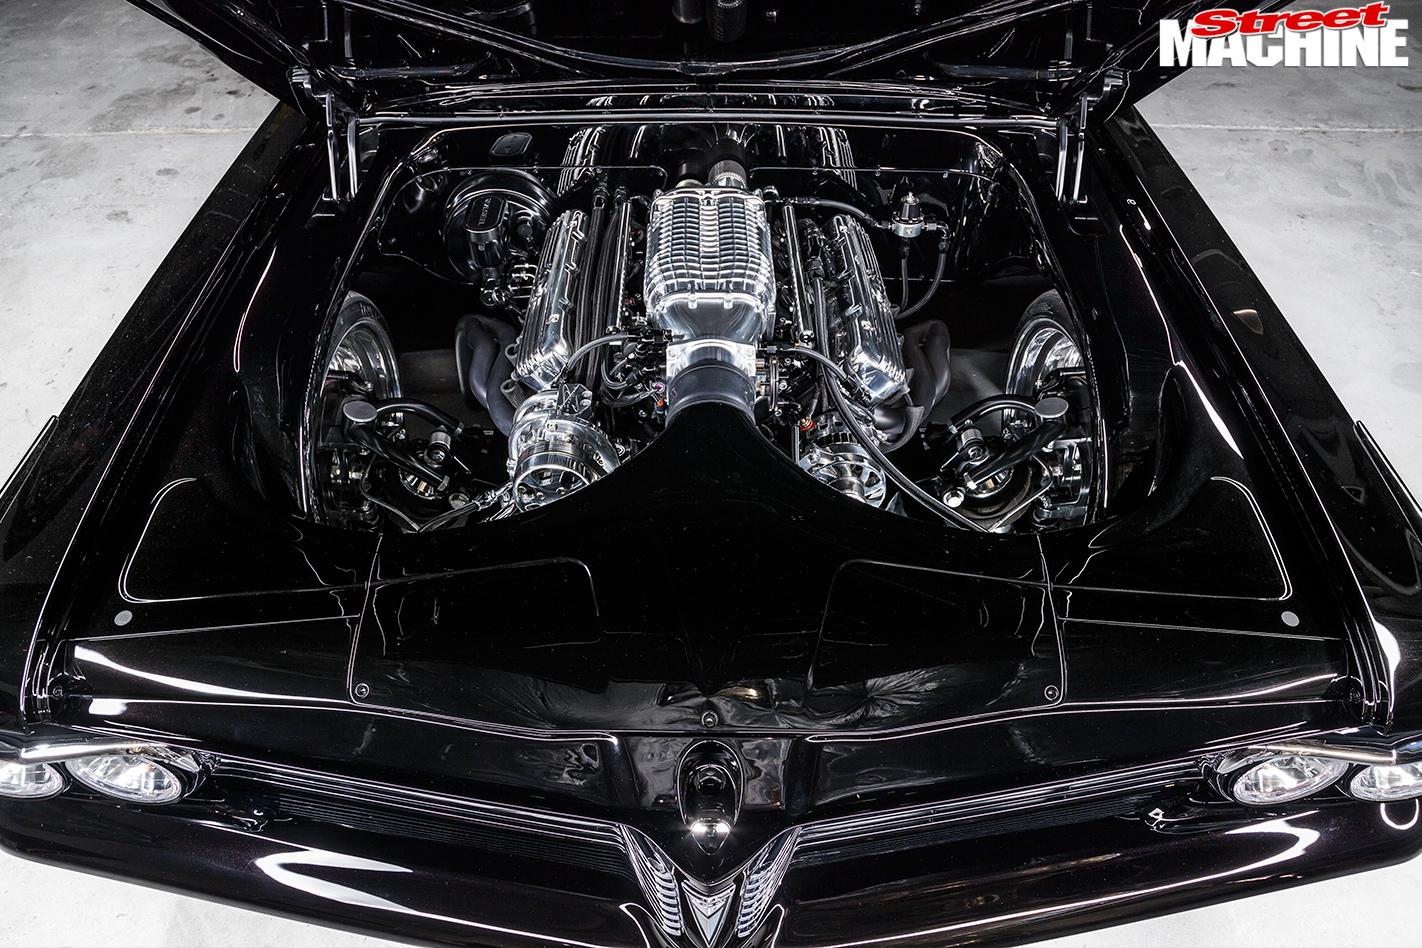 Pontiac -Laurentian -engine -bay